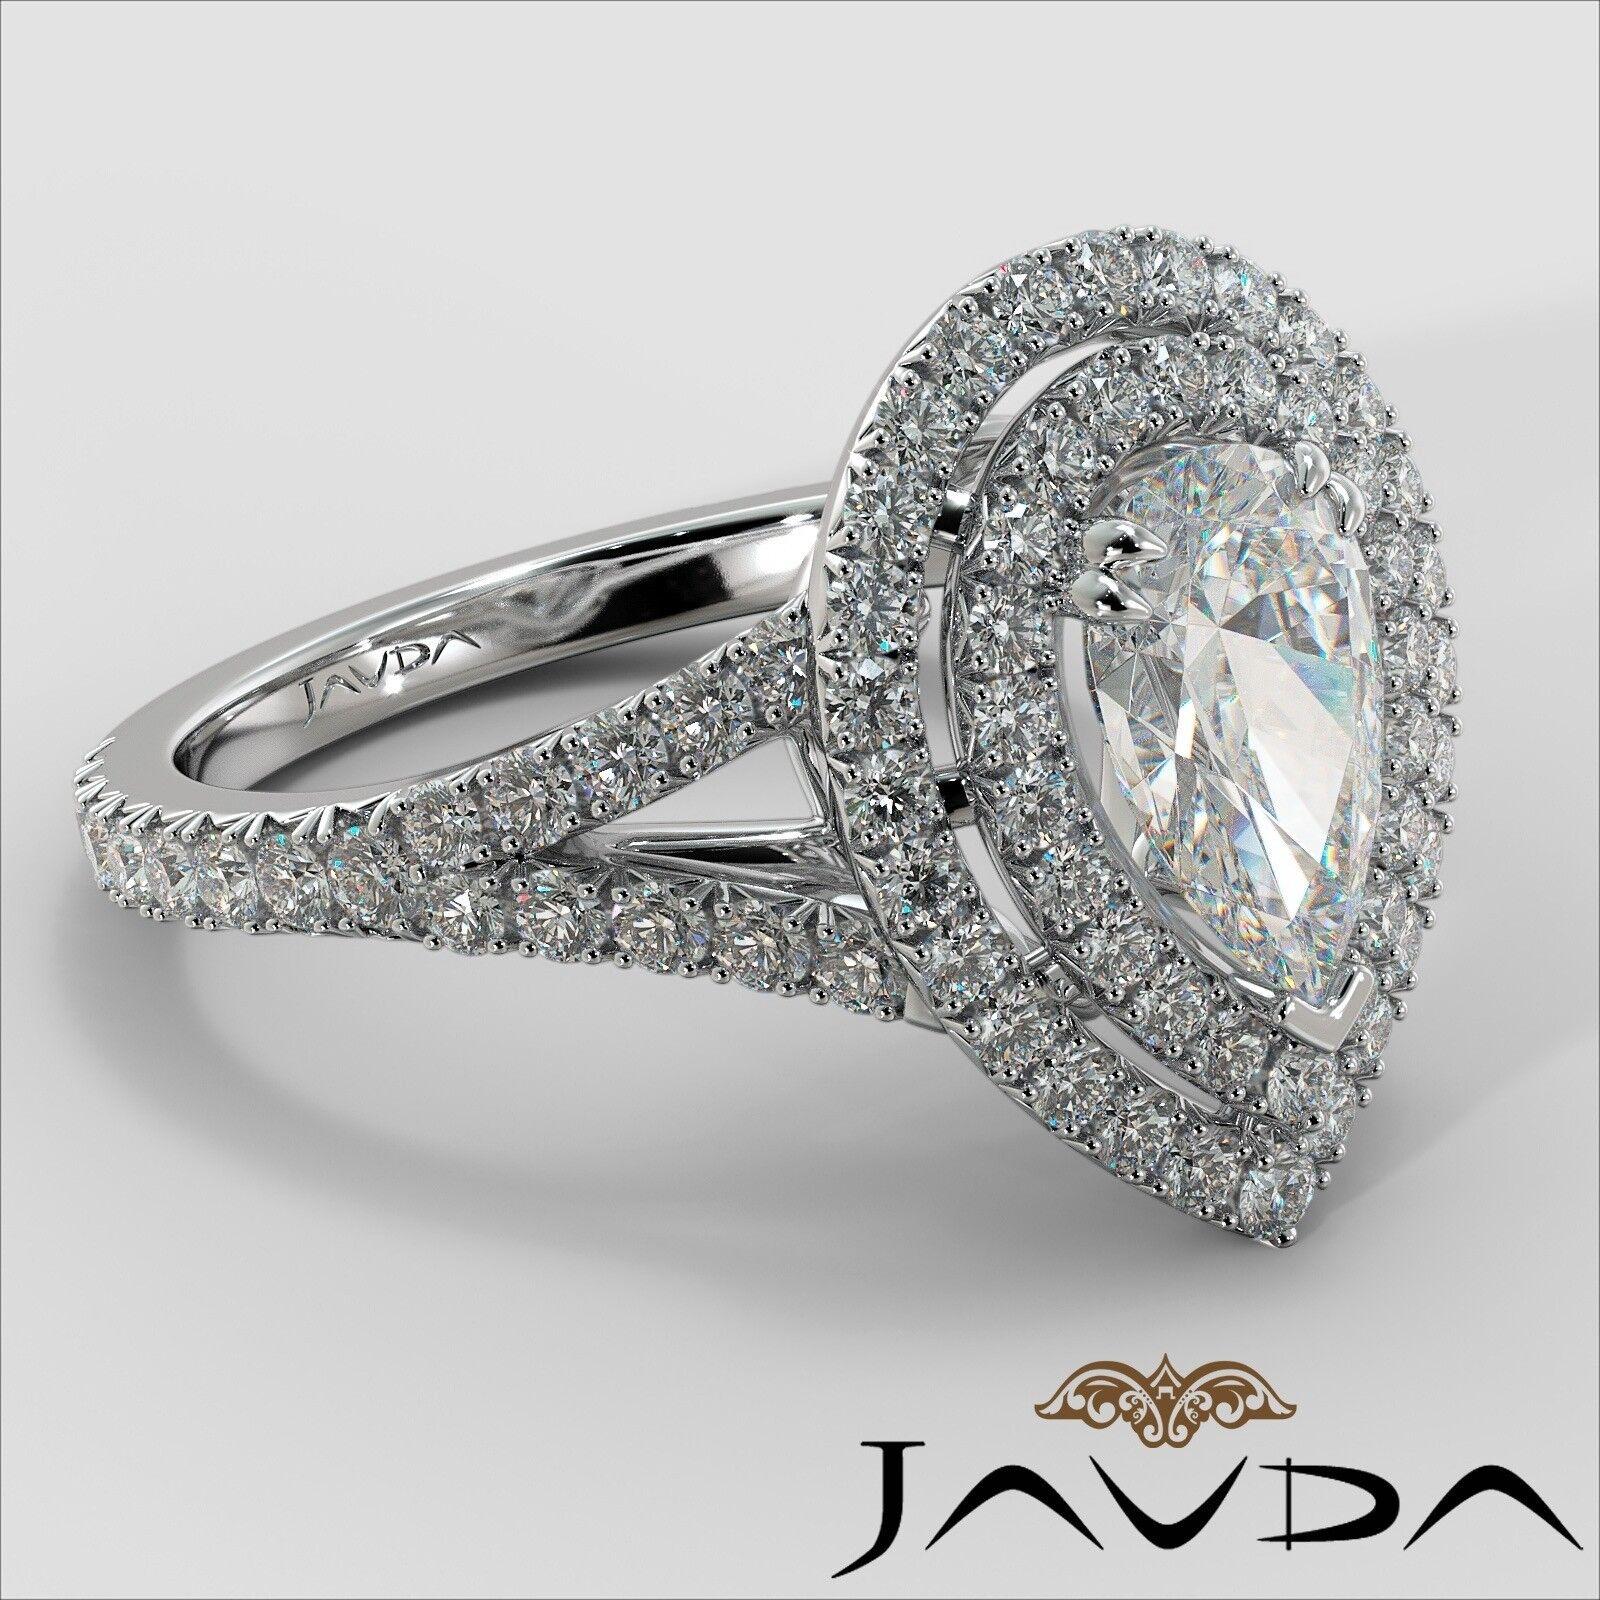 2.12ct Double Halo Split Shank Pear Diamond Engagement Ring GIA E-SI1 White Gold 2